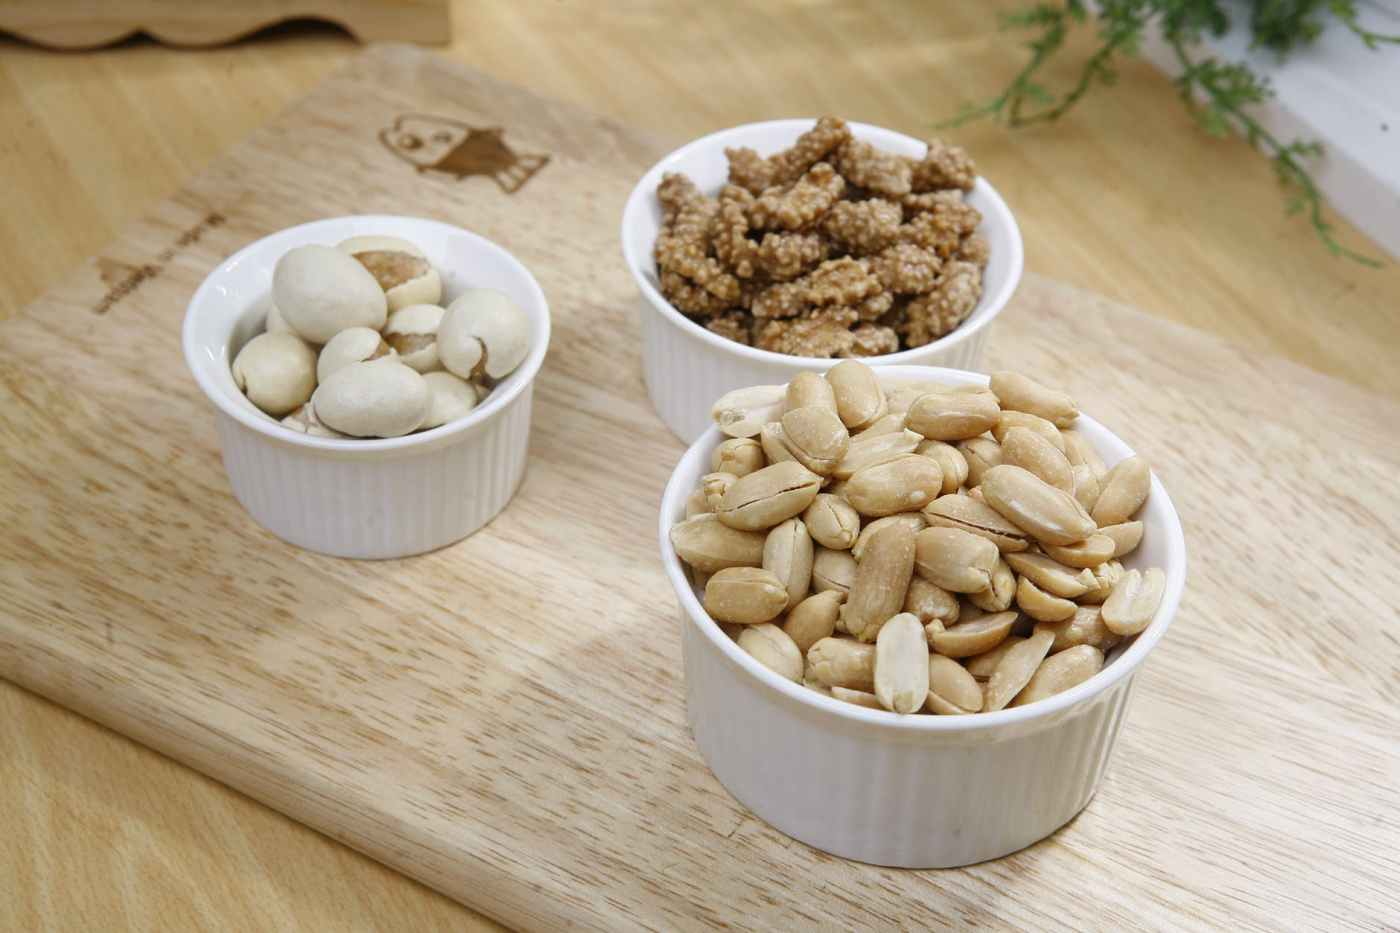 5 Nutritional Secrets to Lose That Stubborn Fat